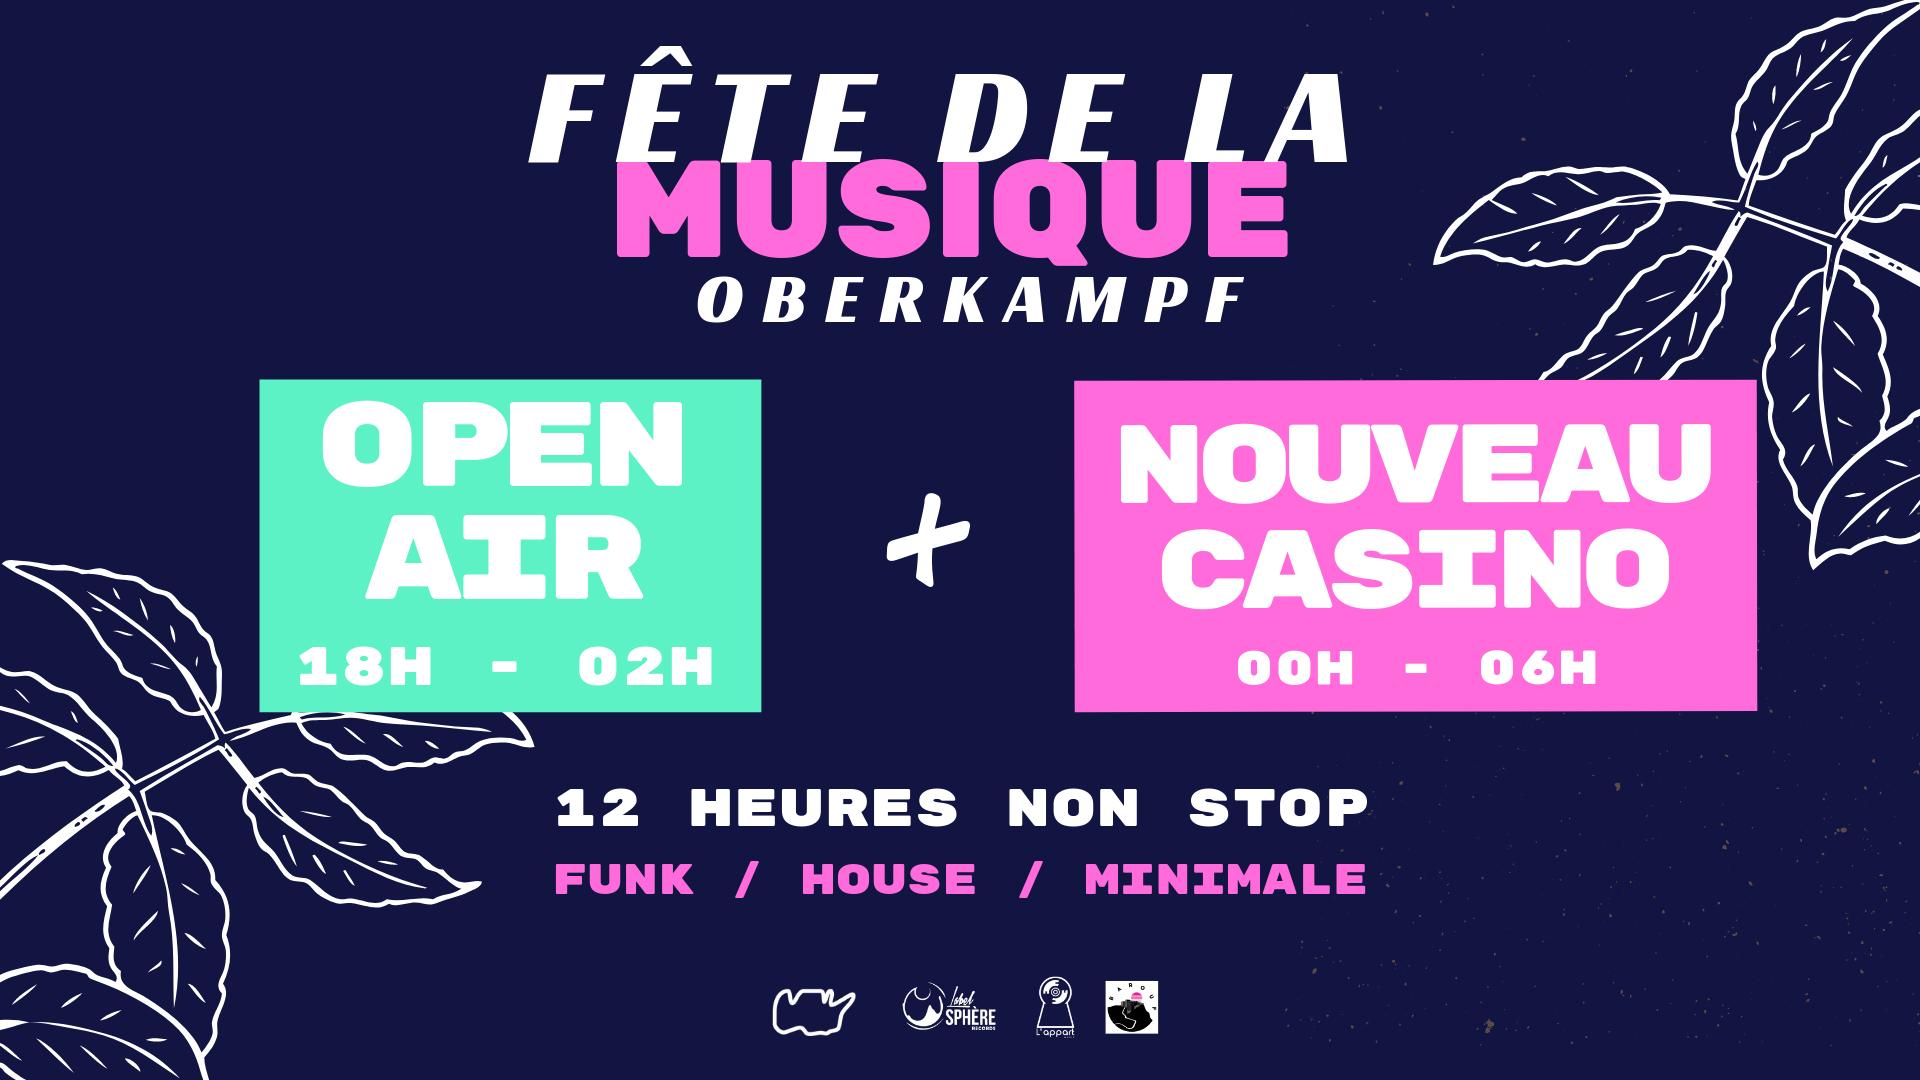 FDLM 2019 : Open Air + Nouveau Casino (12h non stop)